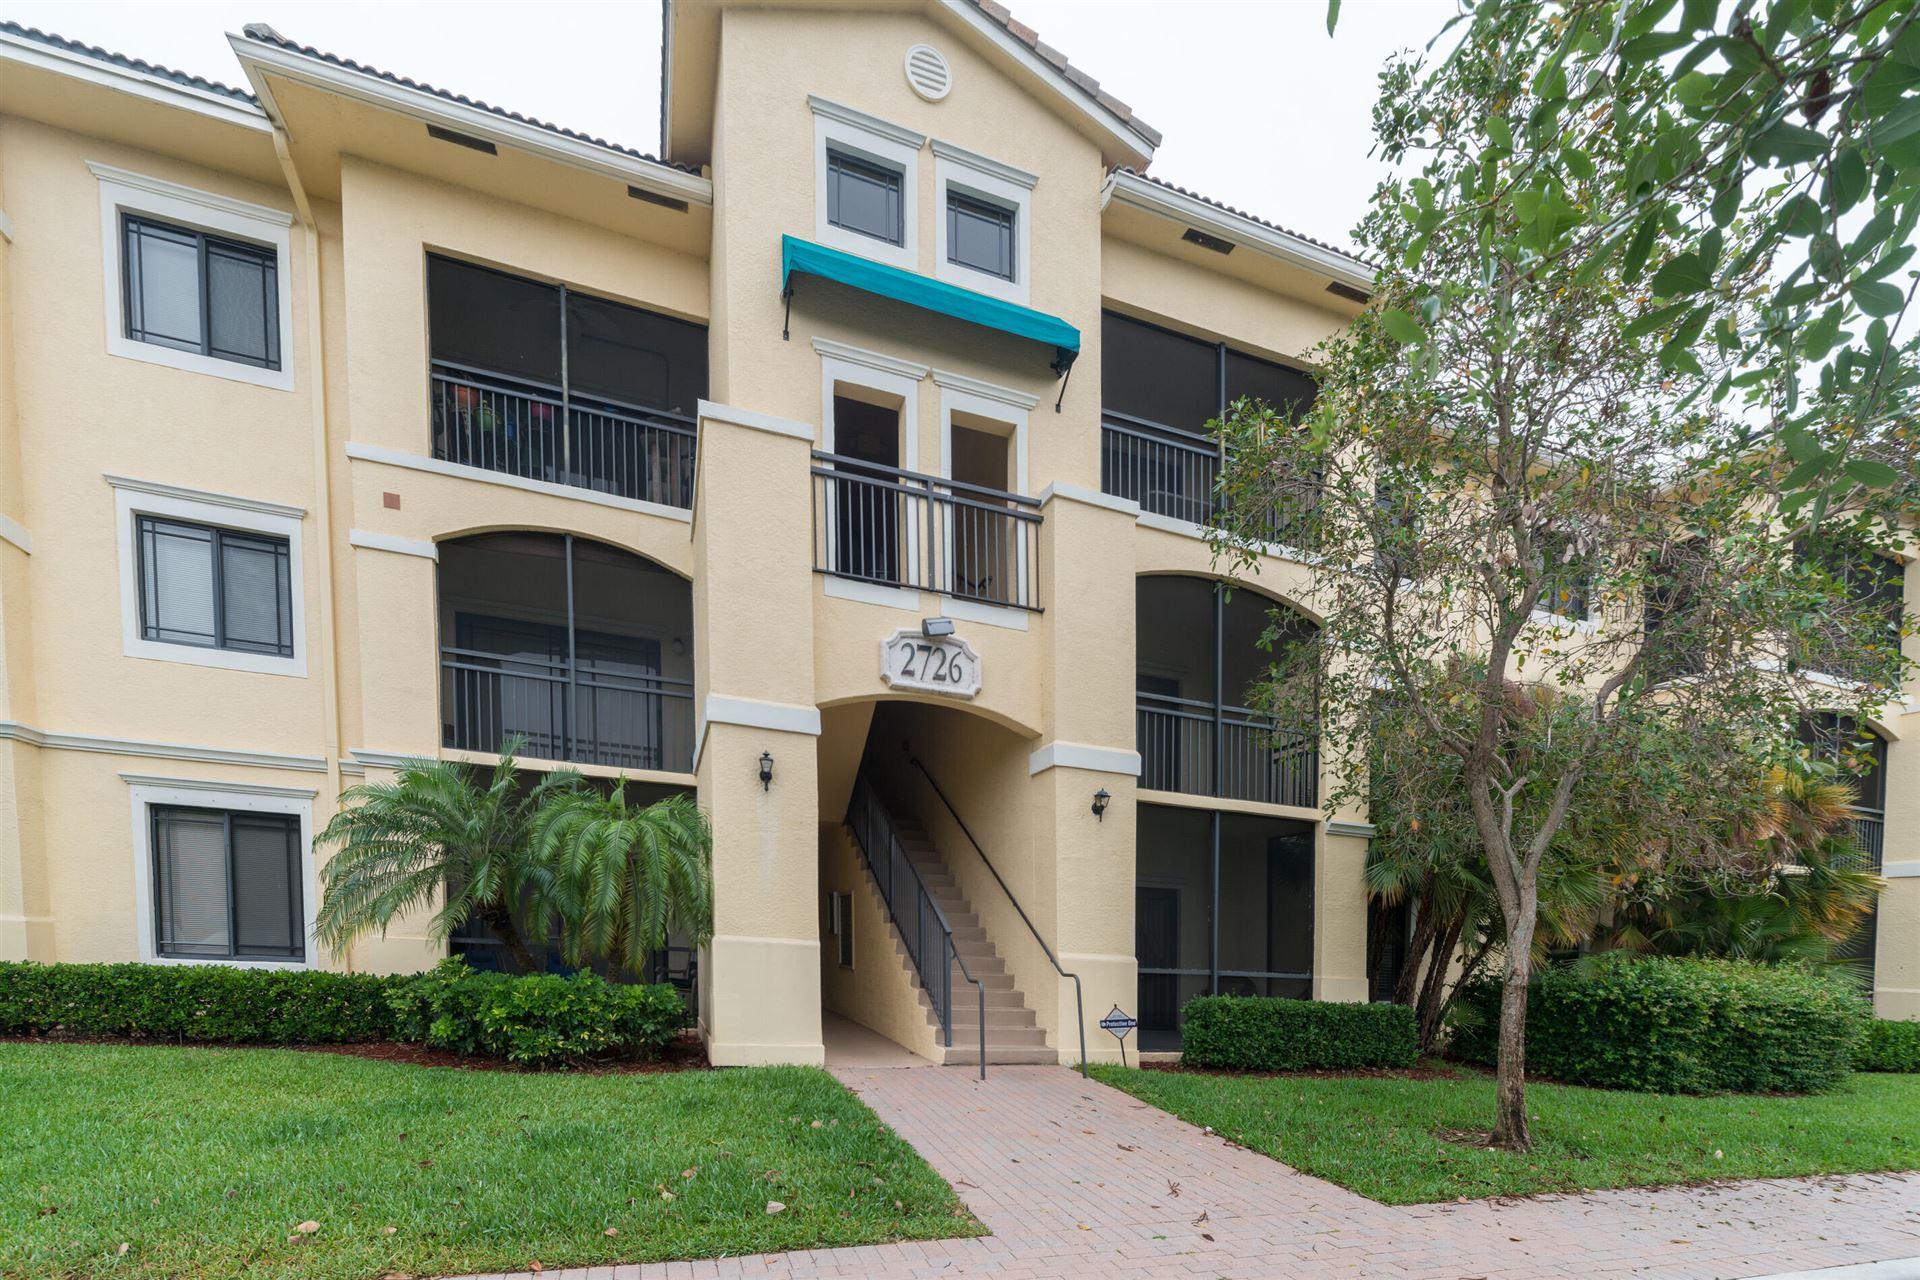 Photo of 2726 Anzio Court #102, Palm Beach Gardens, FL 33410 (MLS # RX-10746975)